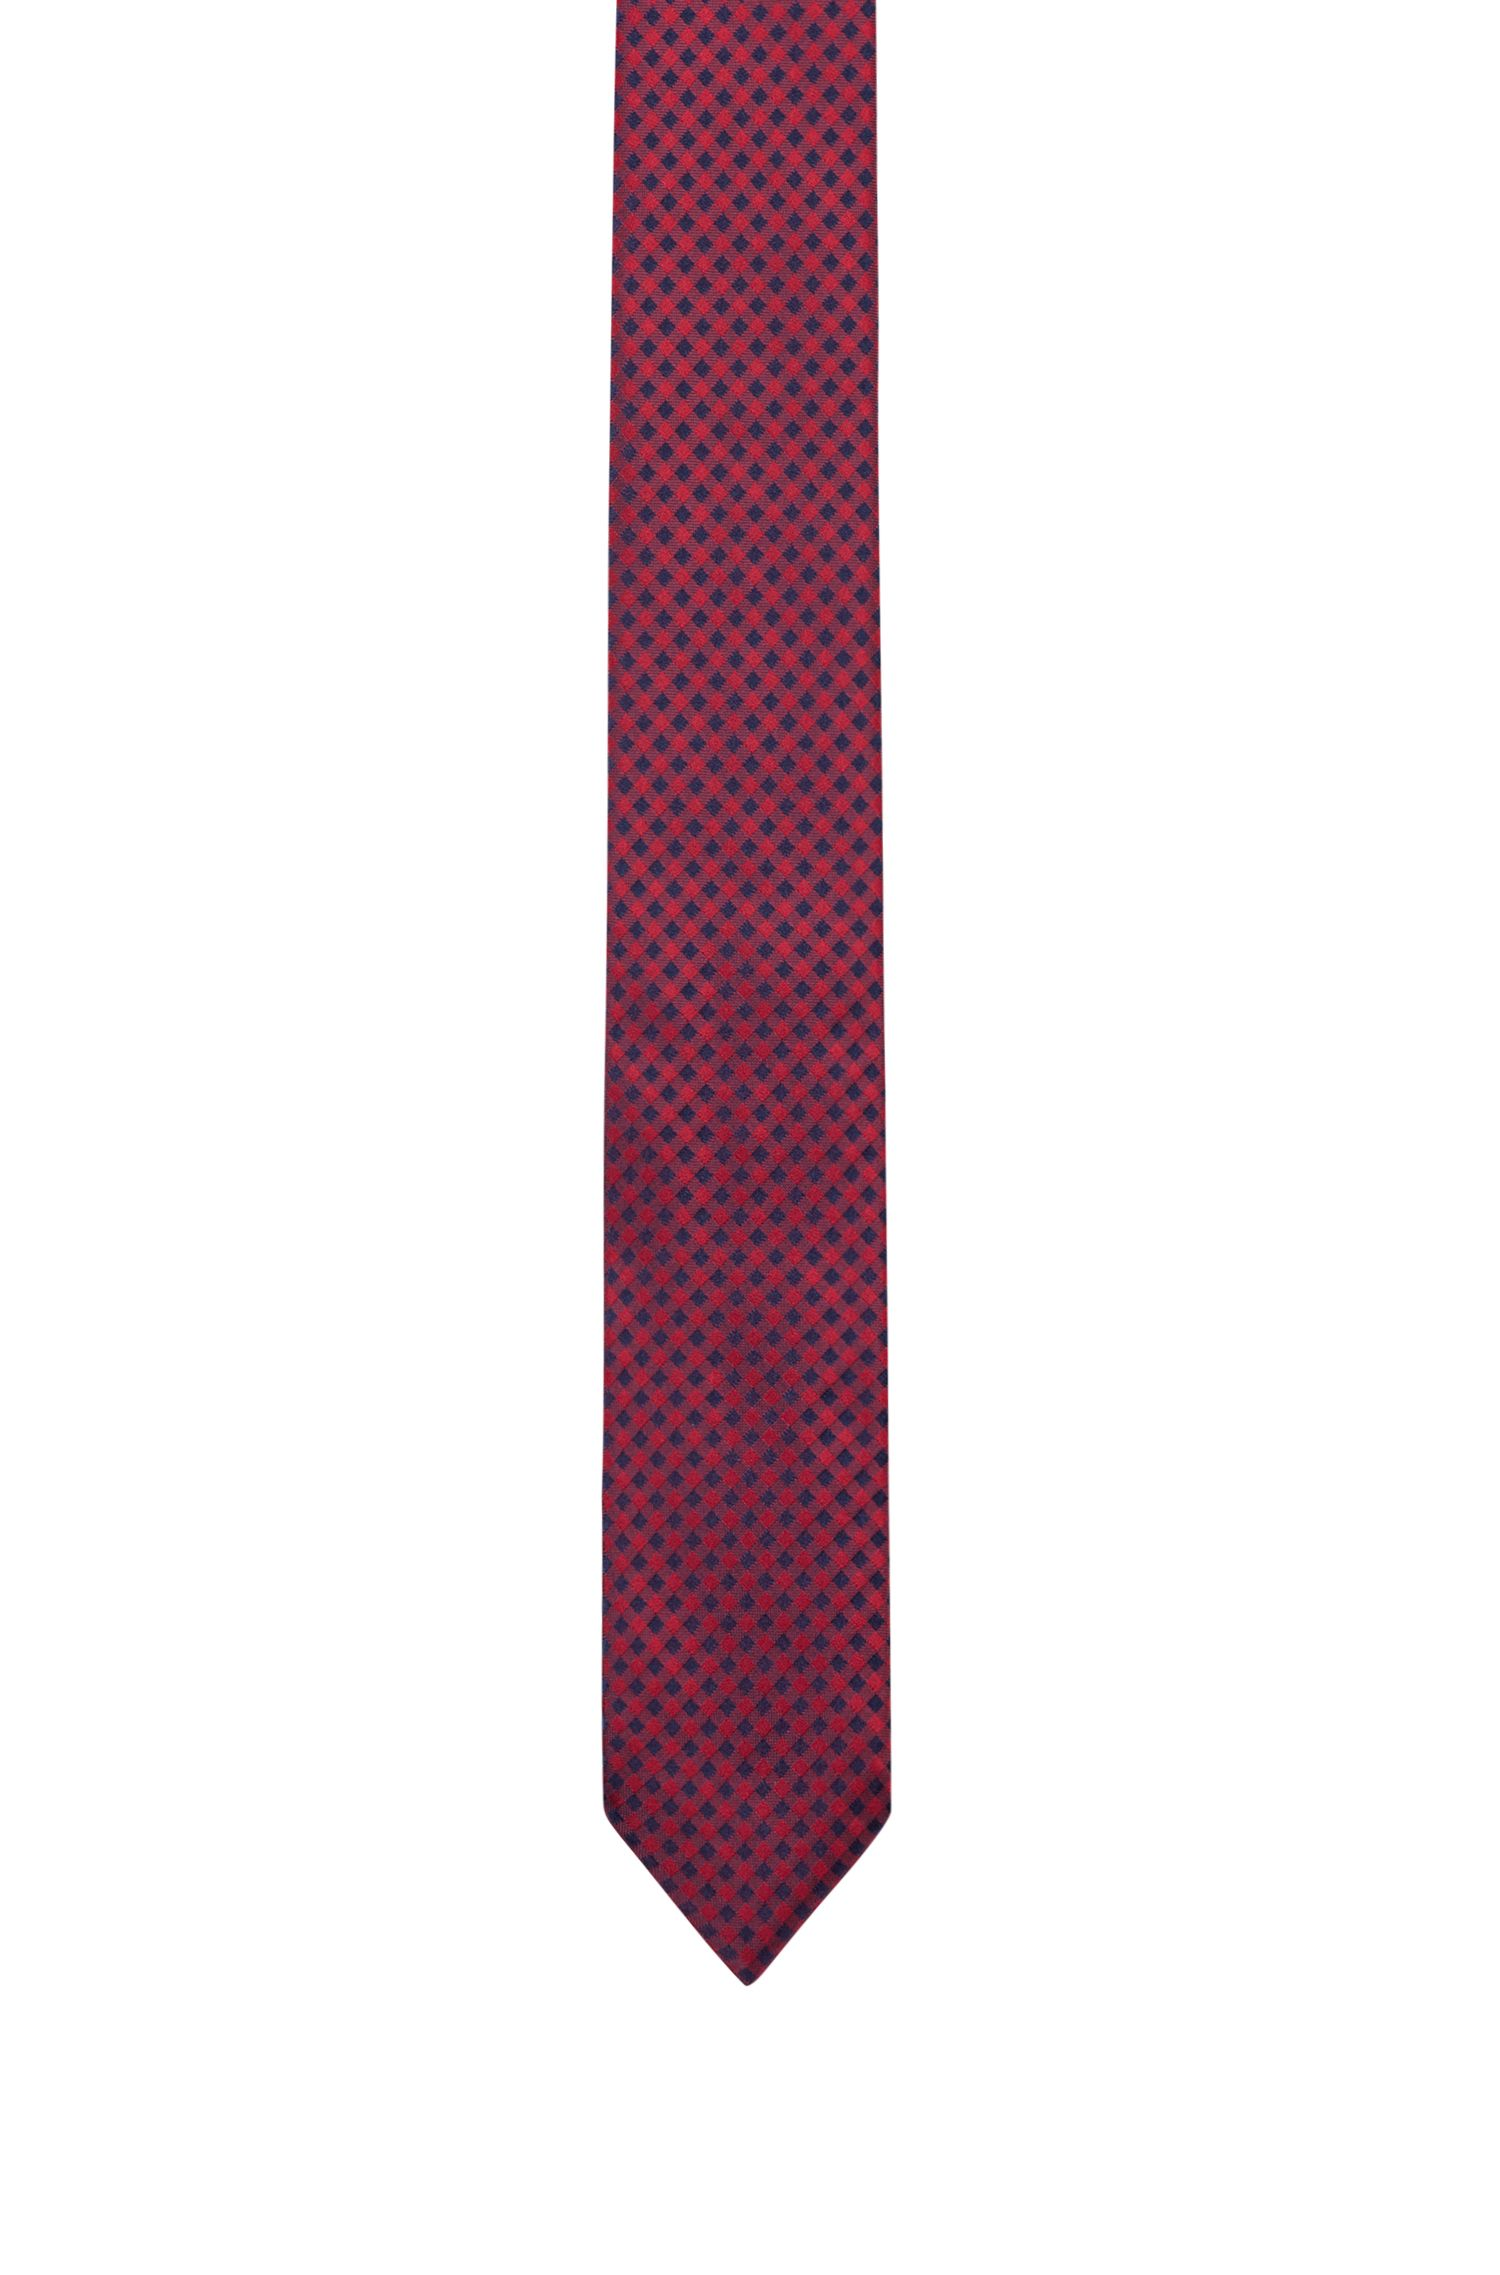 Jacquard-Krawatte aus reiner Seide mit Vichy-Karo, Gemustert